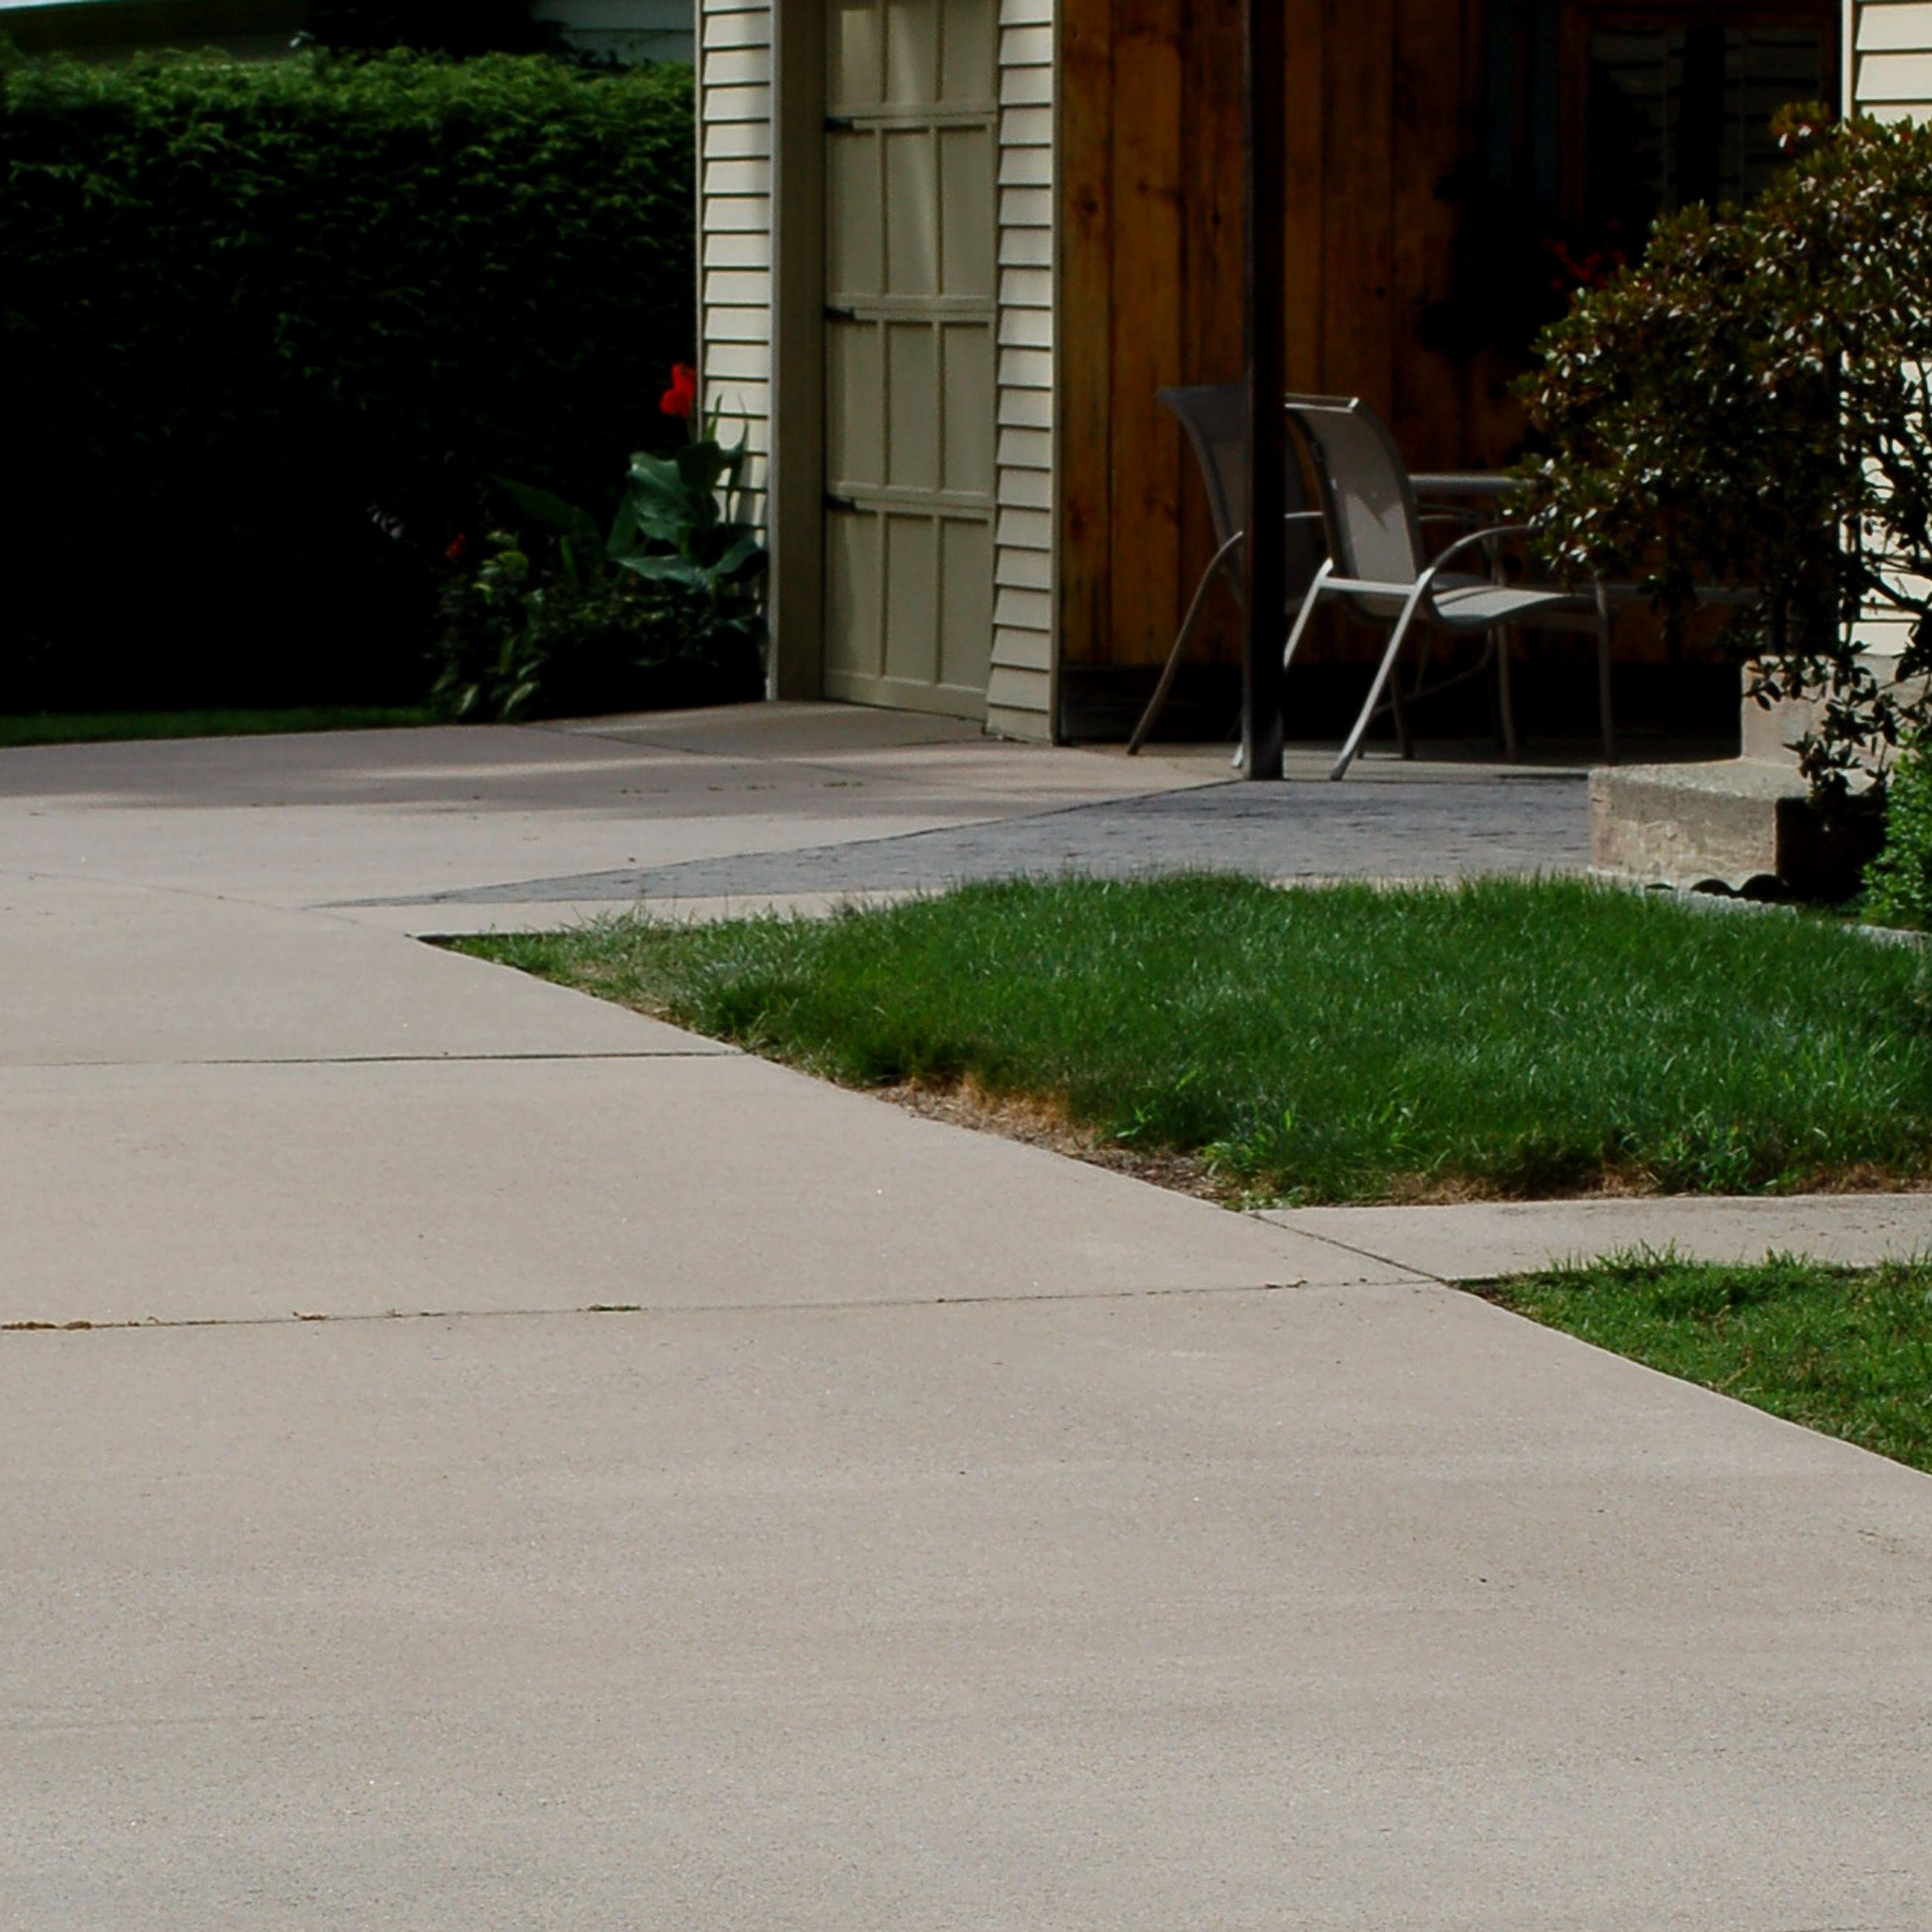 Curing Concrete: Prevent Cracks With Plastic Covering